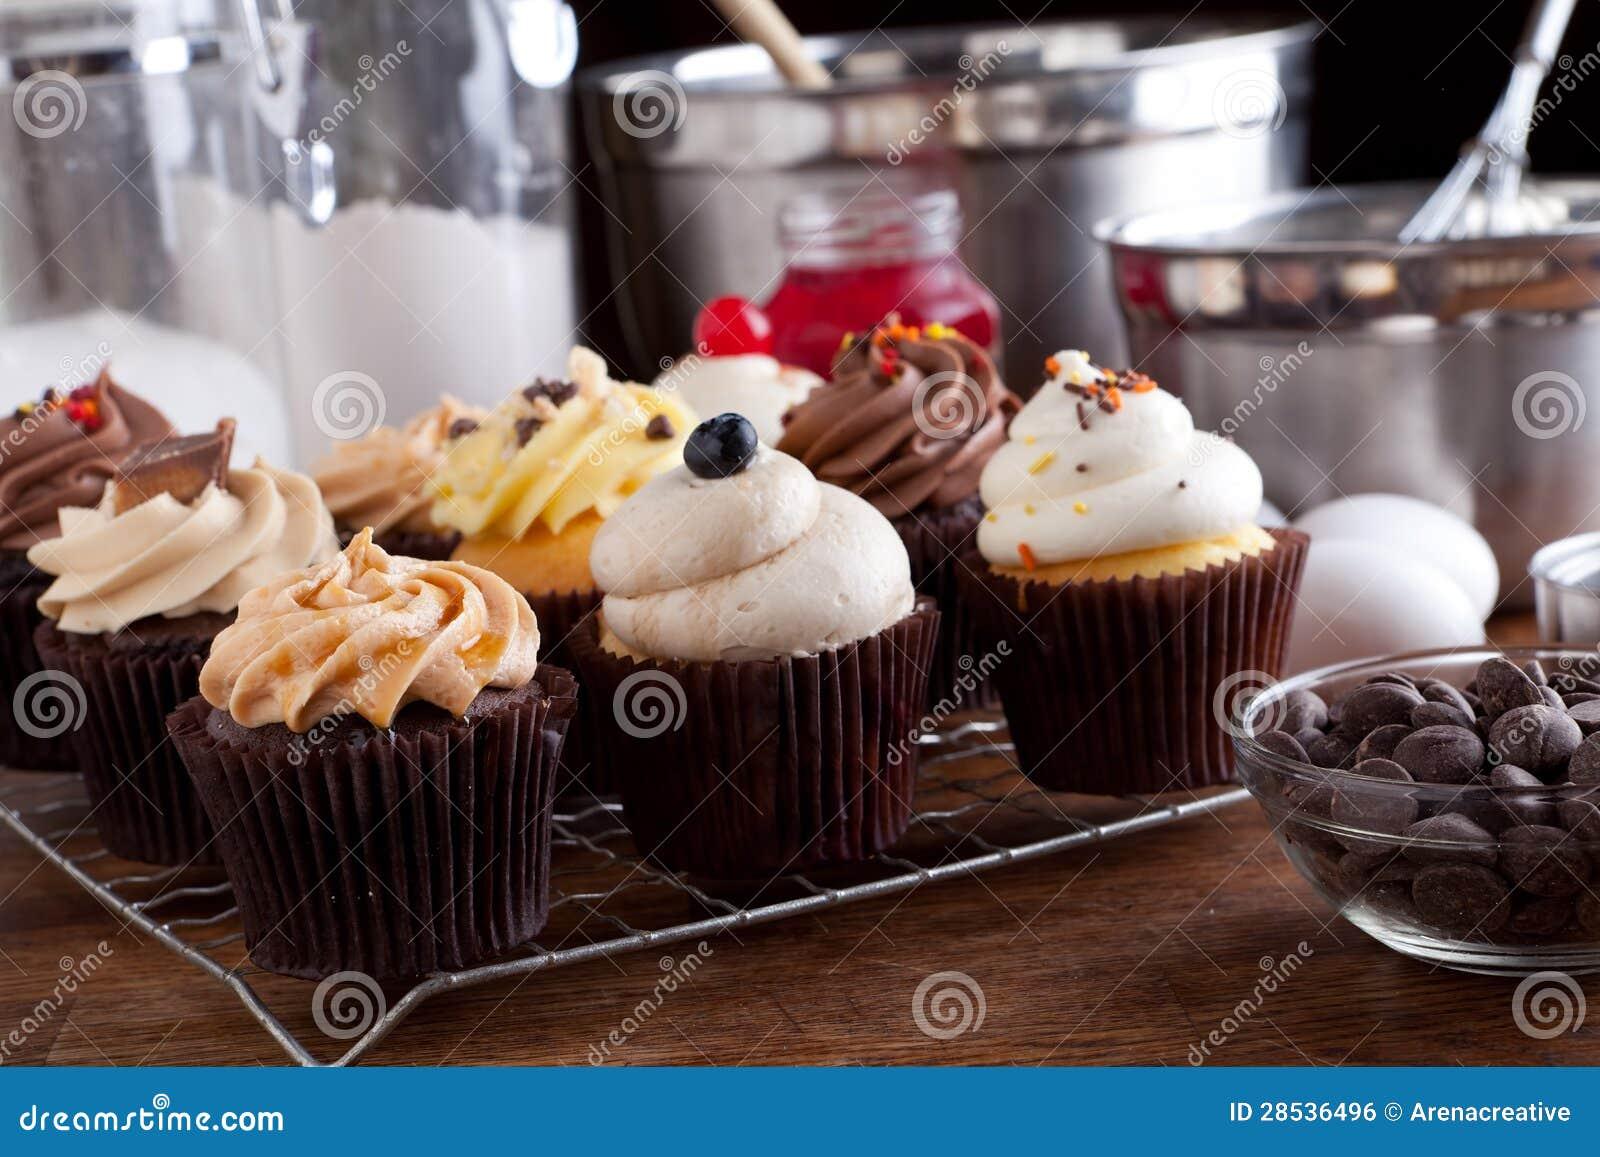 Variety Of Gourmet Cupcakes Stock Photo Image 28536496